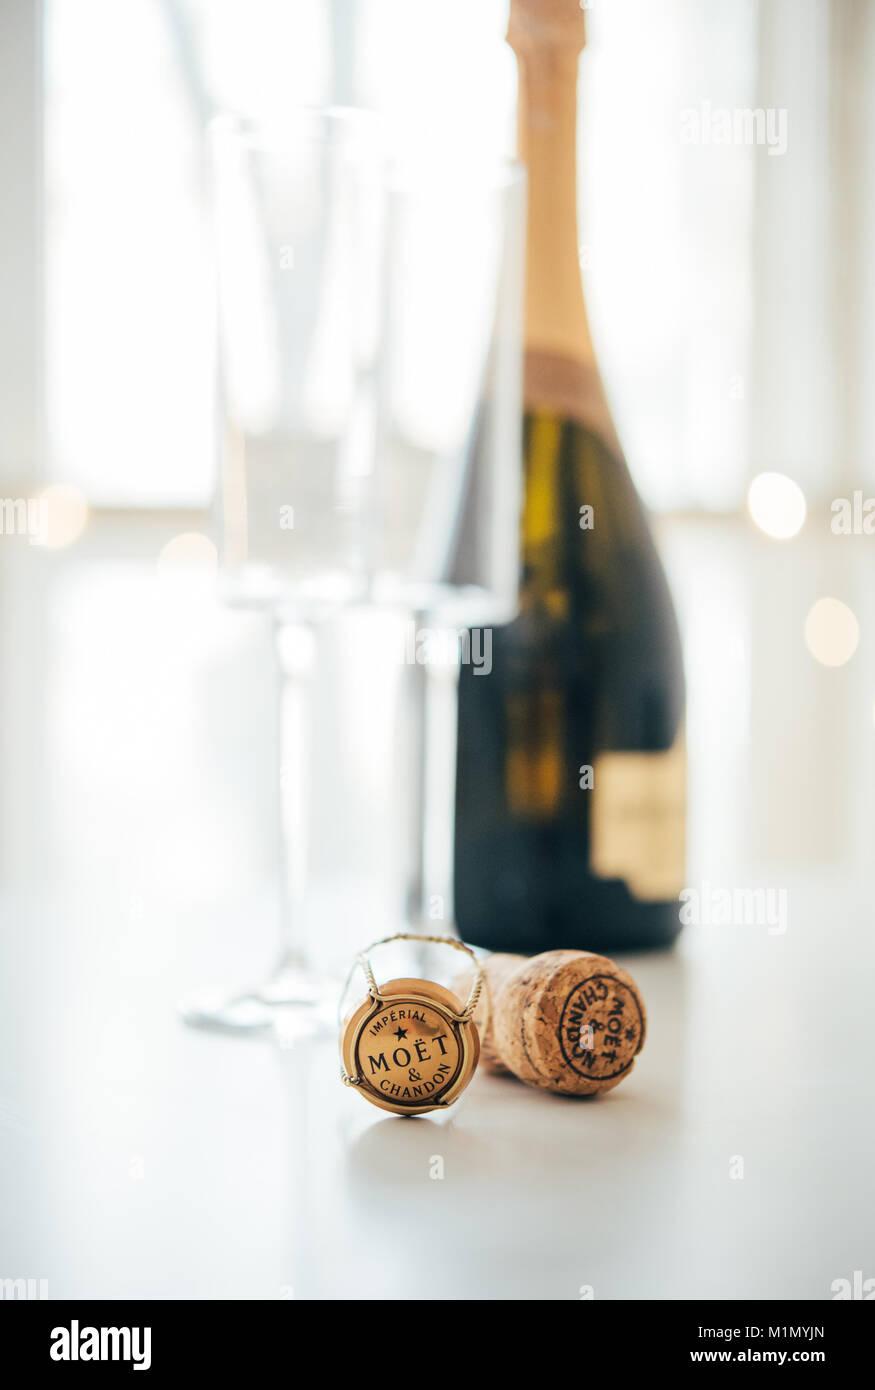 Odesa, Ucrania - 30 de Enero 2018: Moet & Chandon Champagne cork Foto de stock